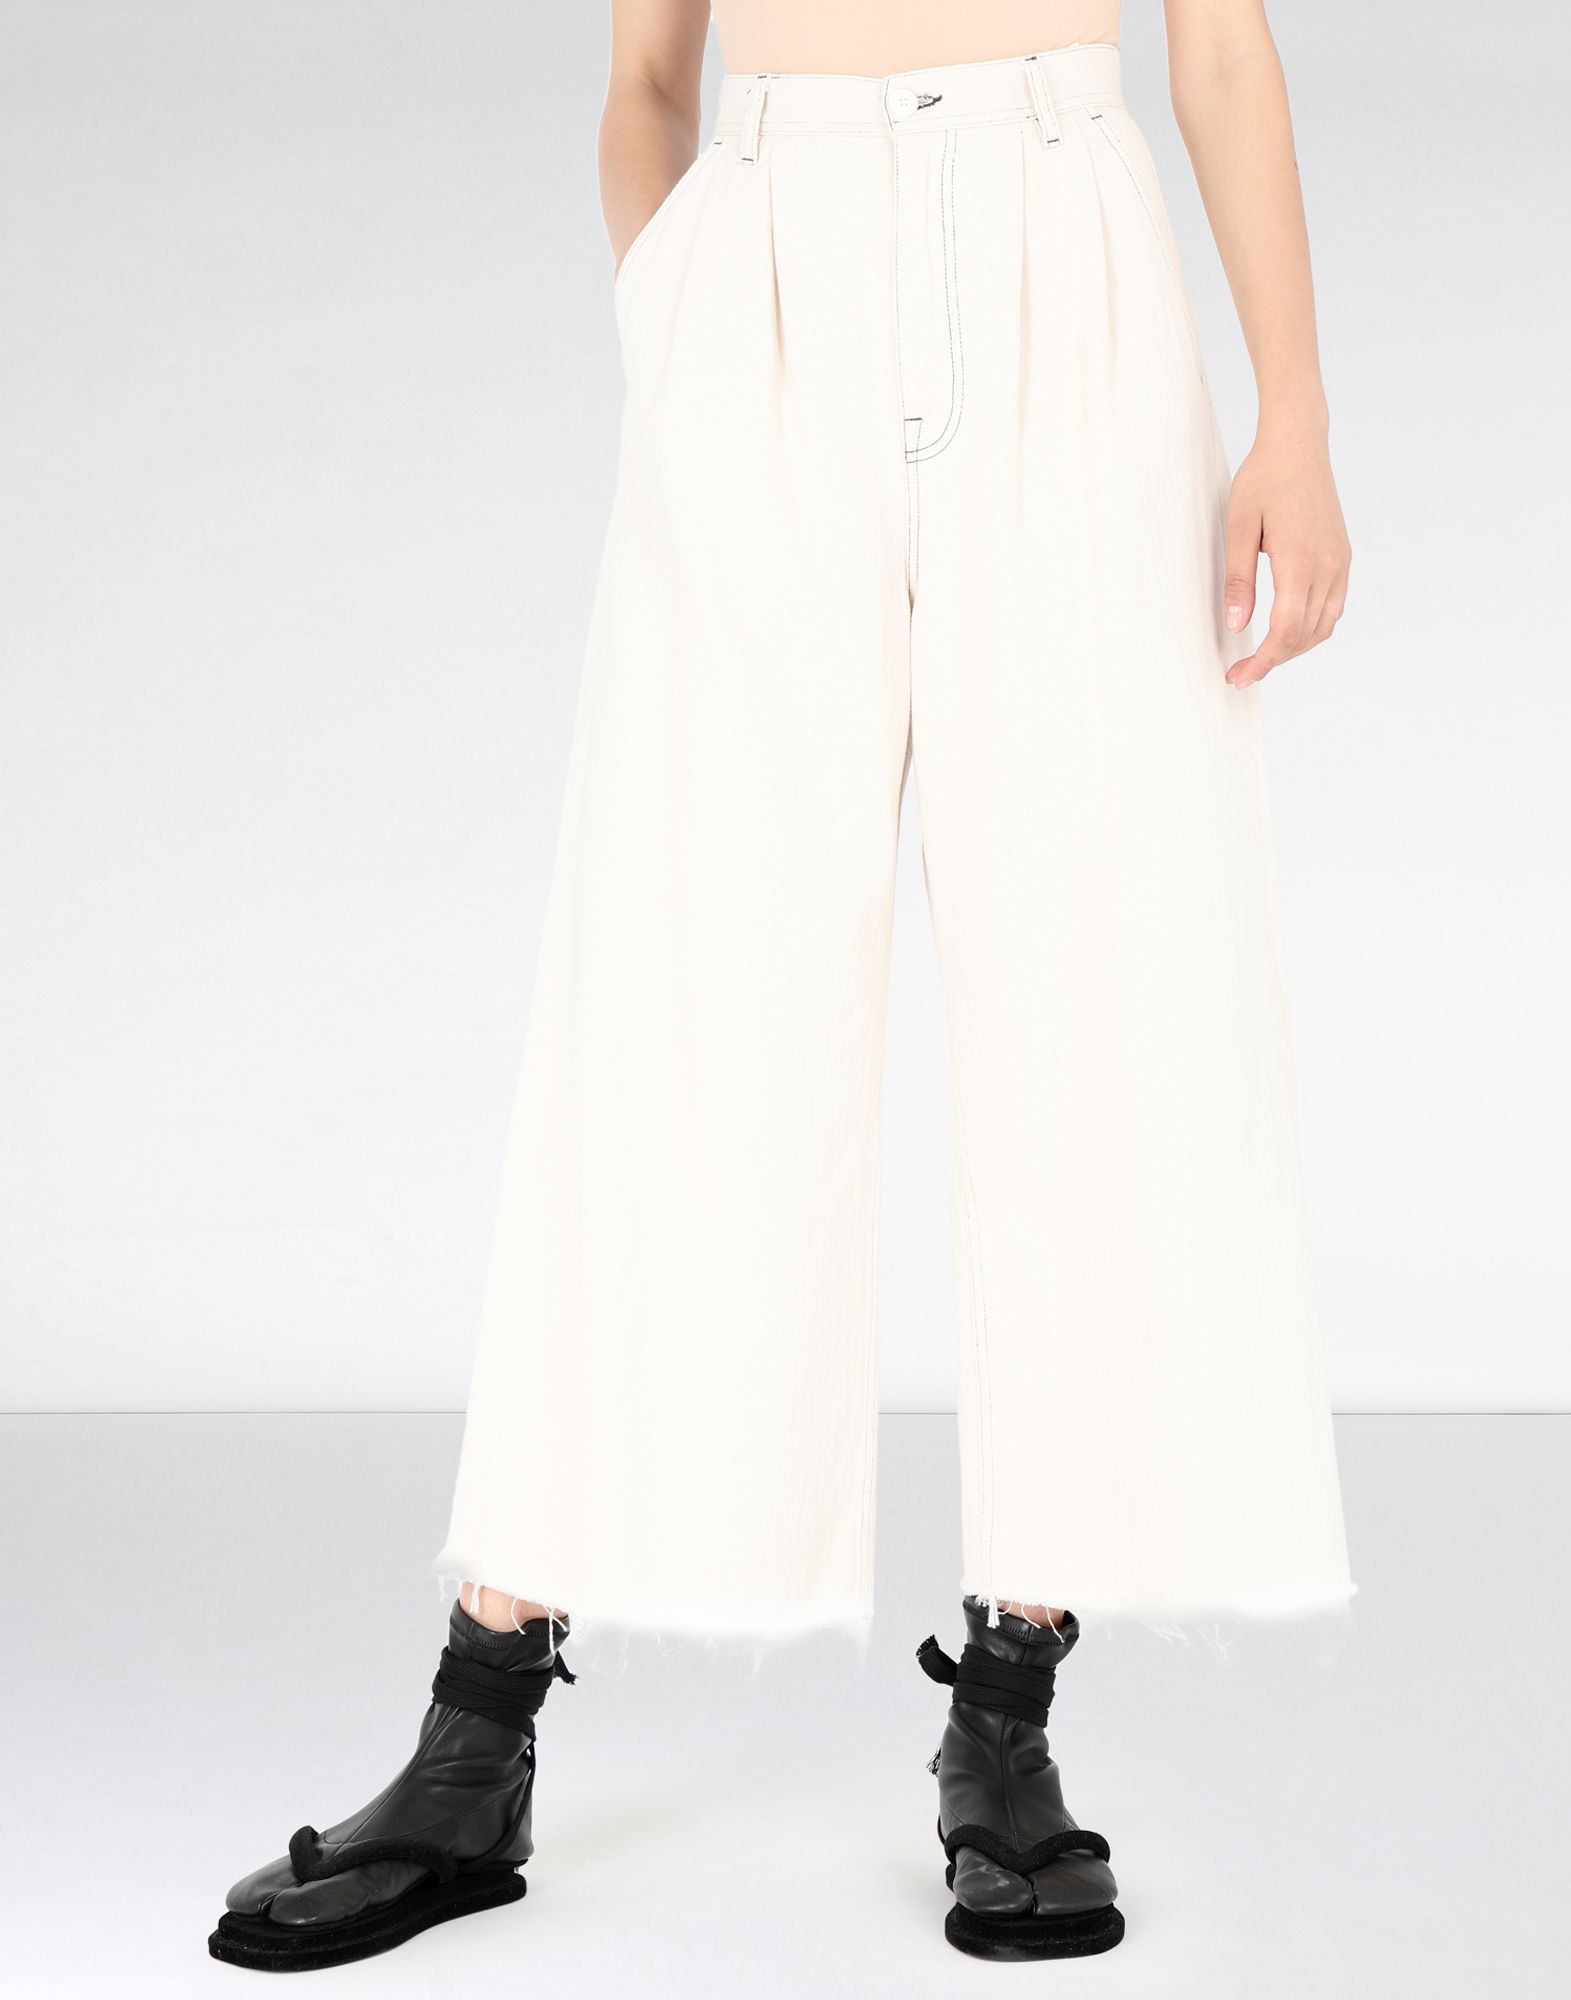 MM6 MAISON MARGIELA Flared cotton trousers Casual pants Woman f